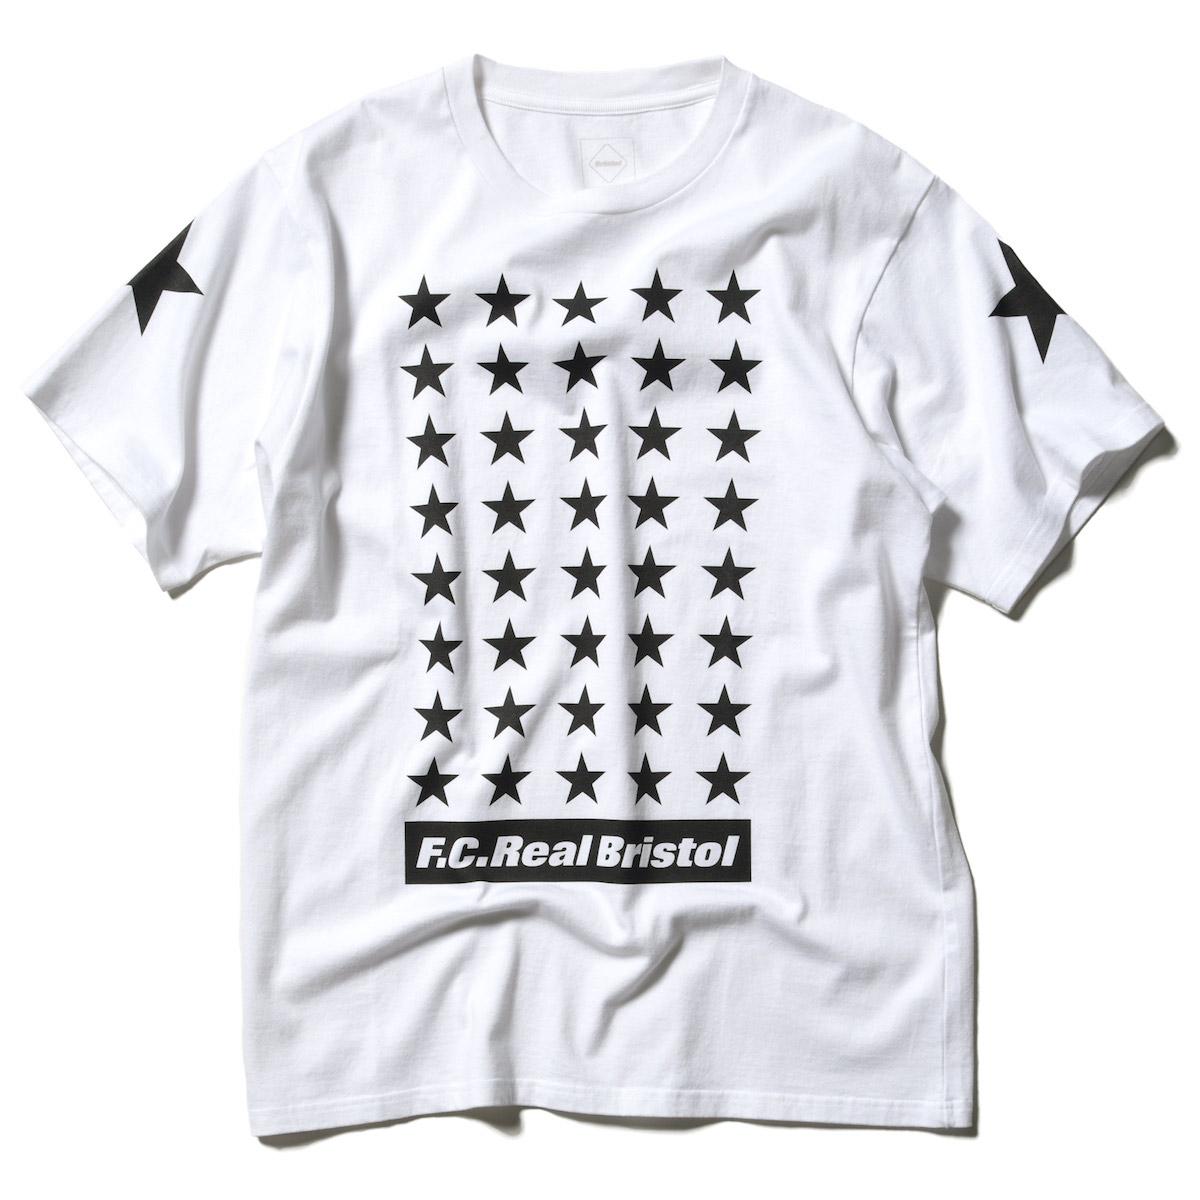 F.C.Real Bristol / 42 STARS TEE -White